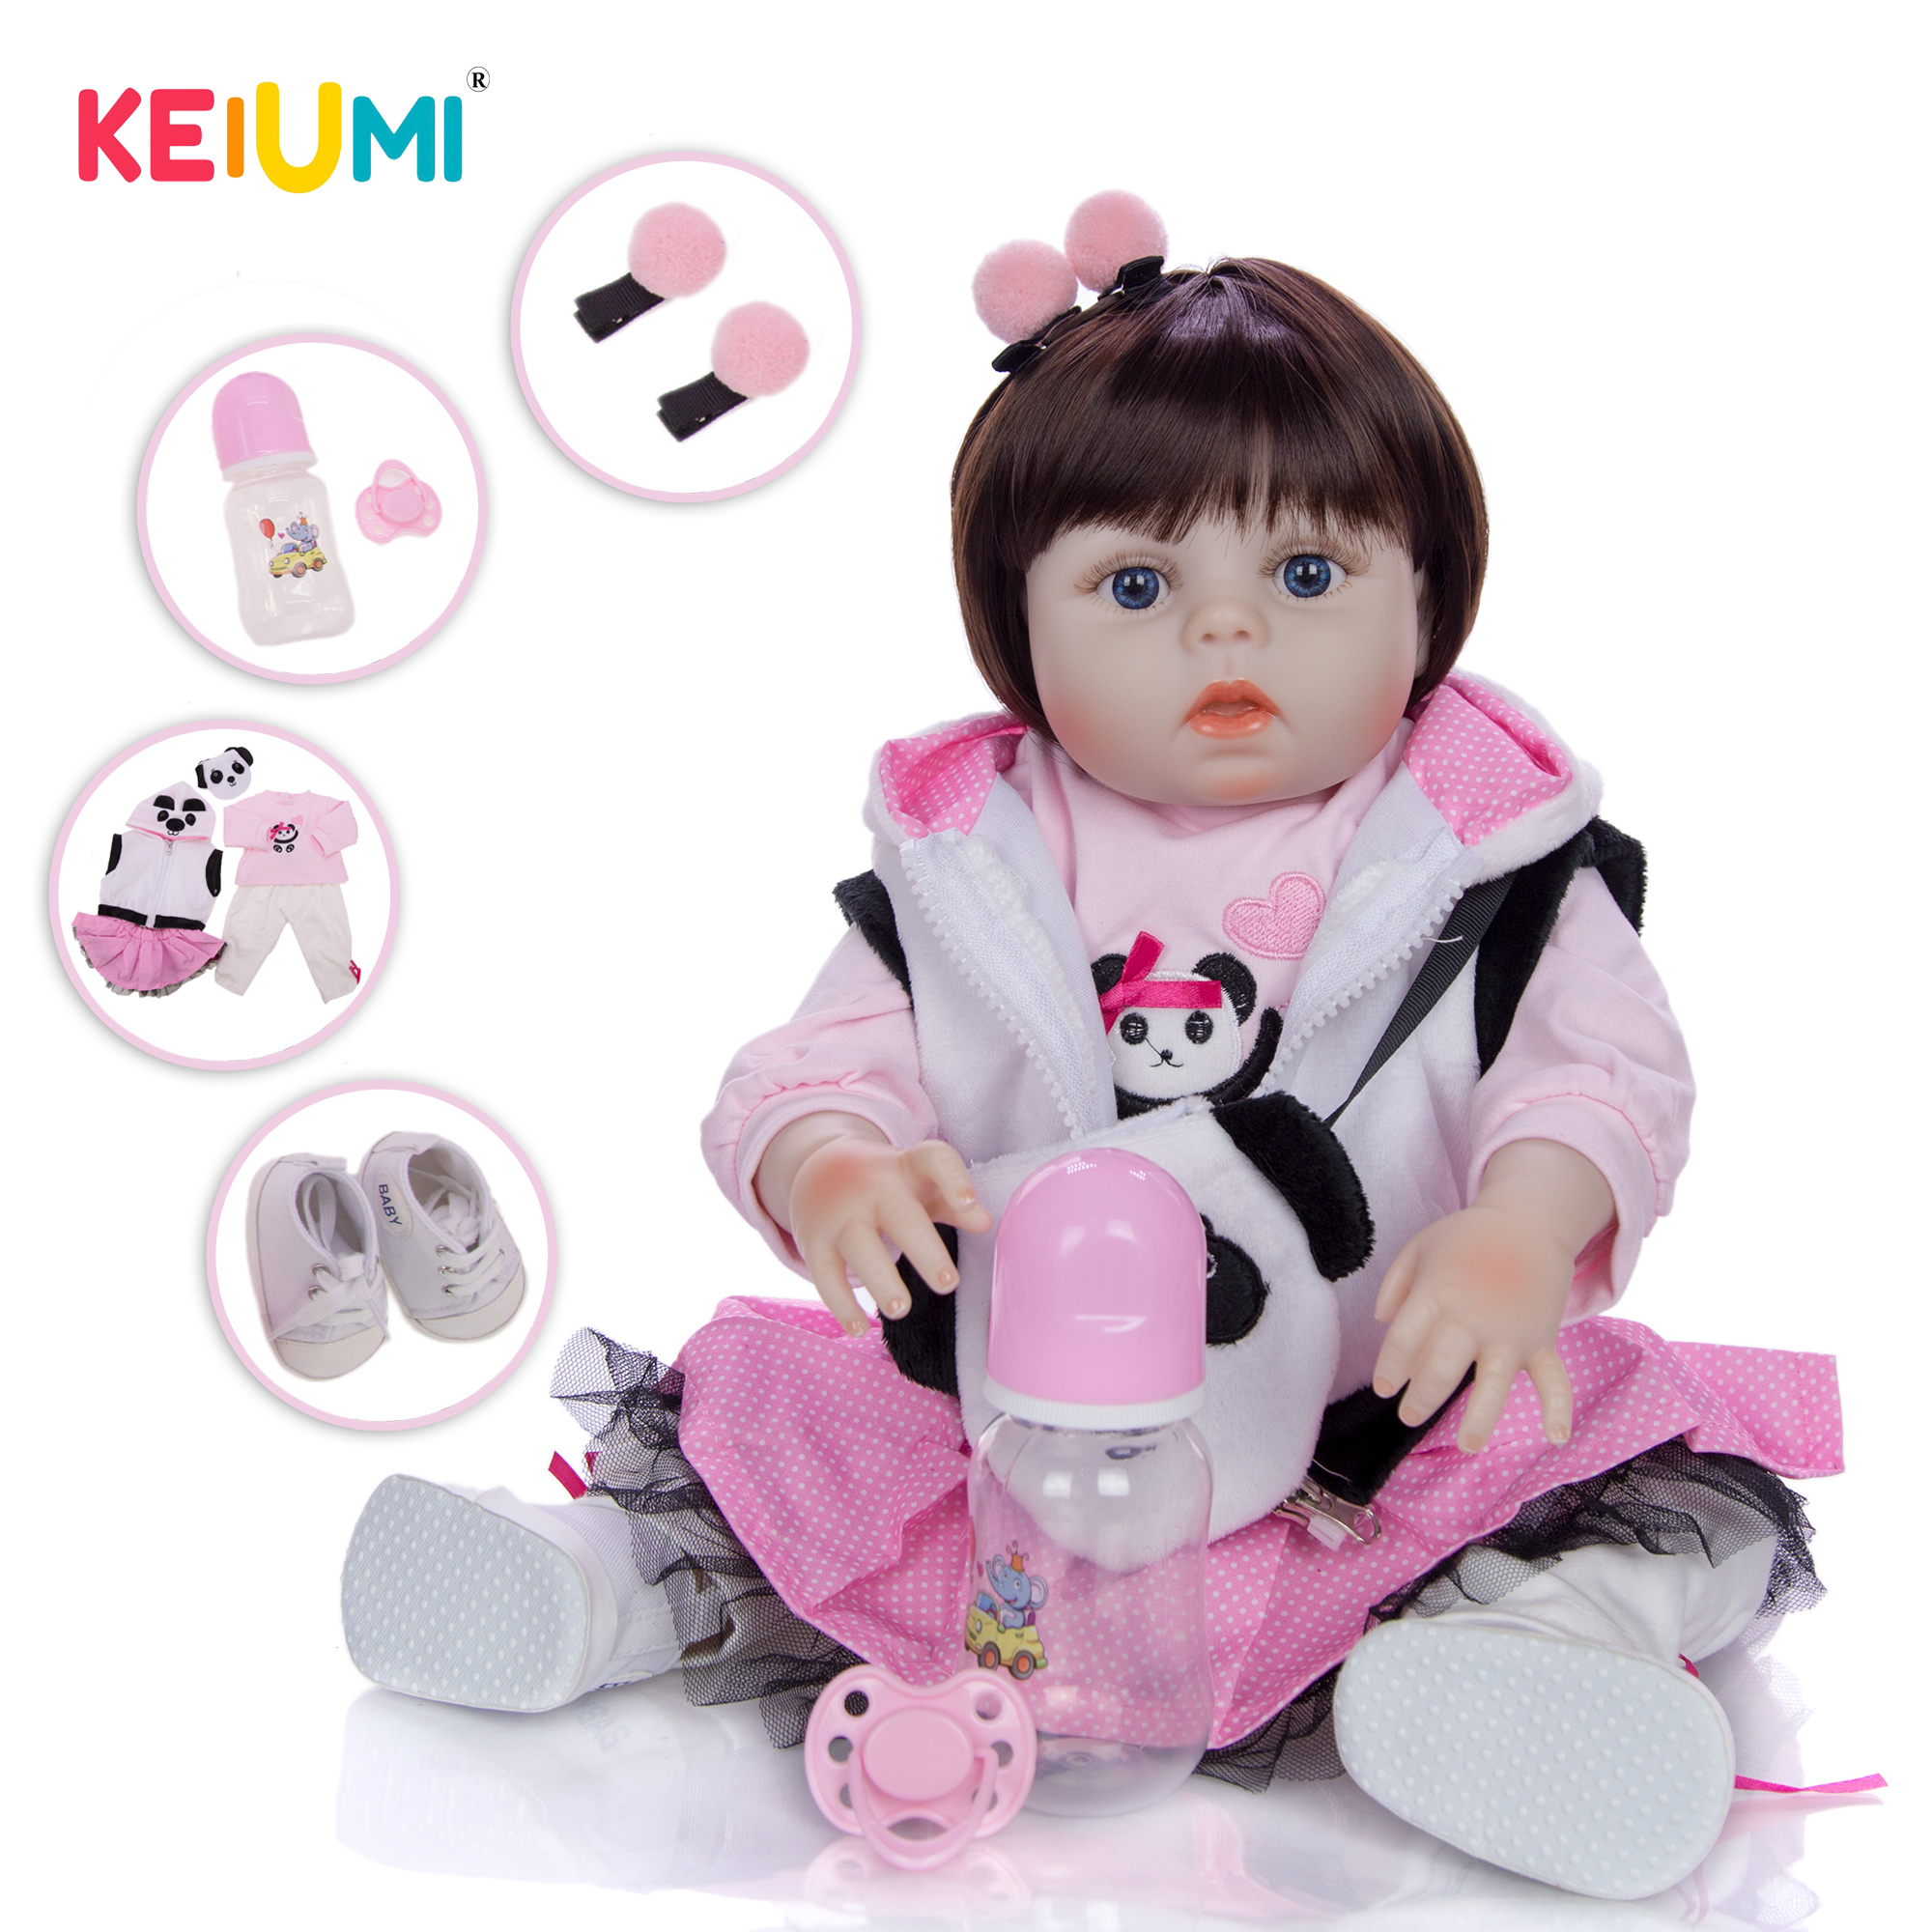 KEIUMI Fashion Cosplay Panda Reborn Baby Dolls Full Silicone Vinyl 48 cm Realistic Reborn Boneca